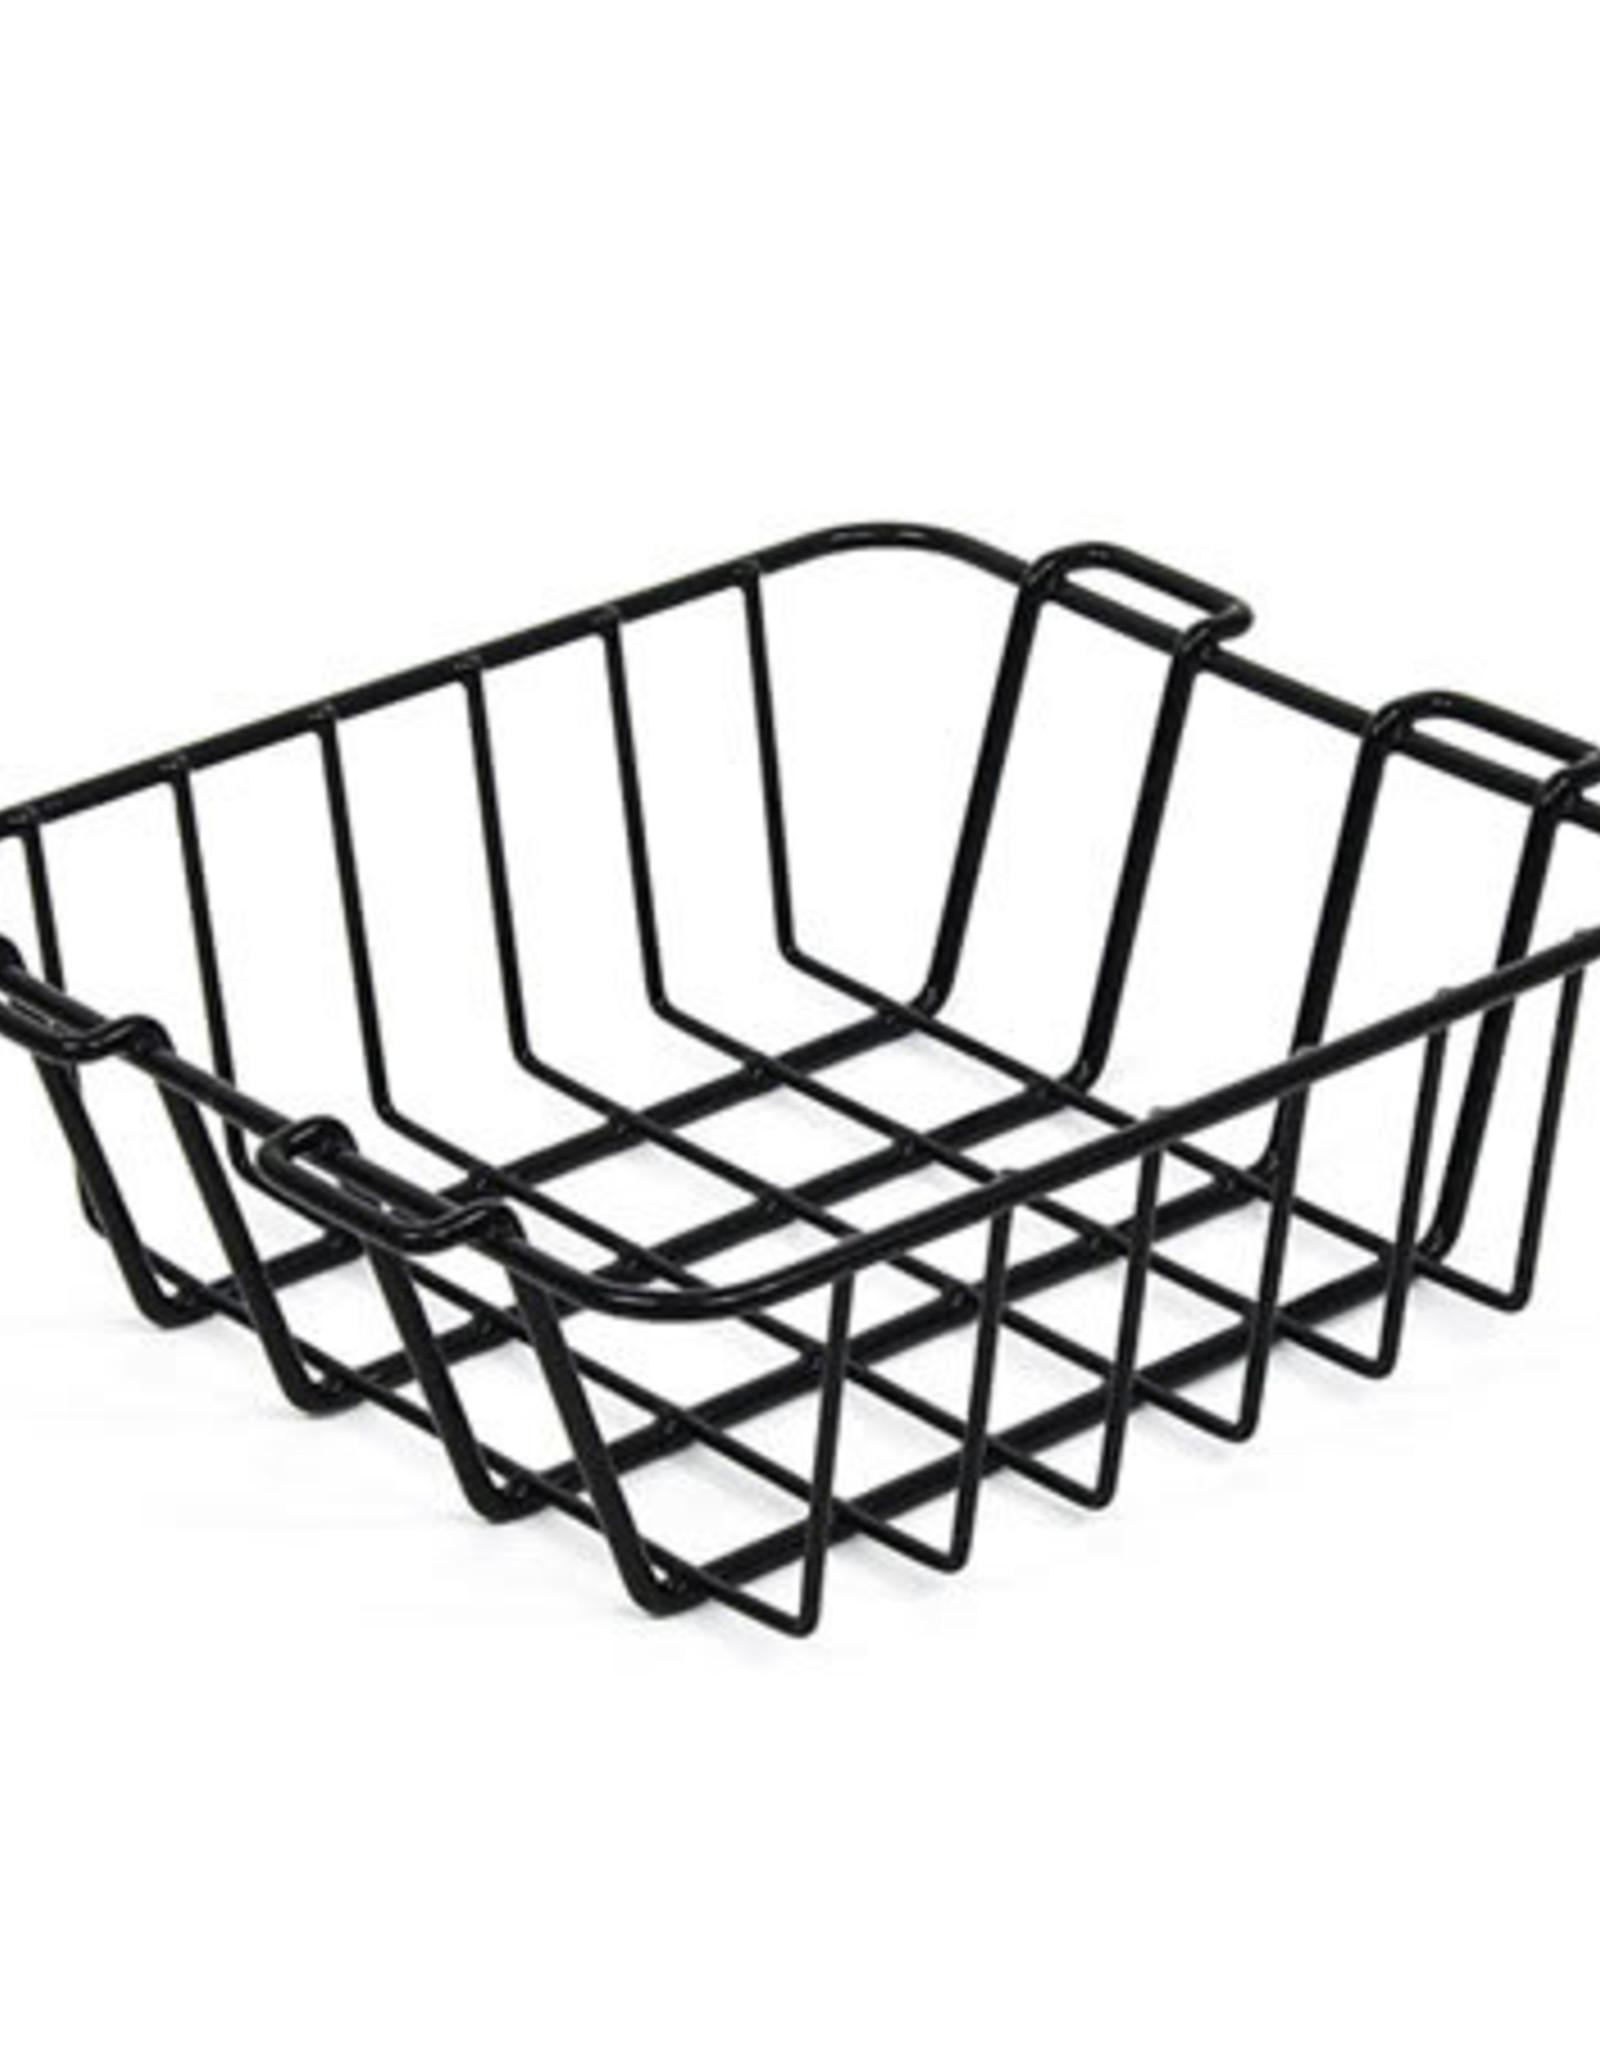 RTIC RTIC Basket 45